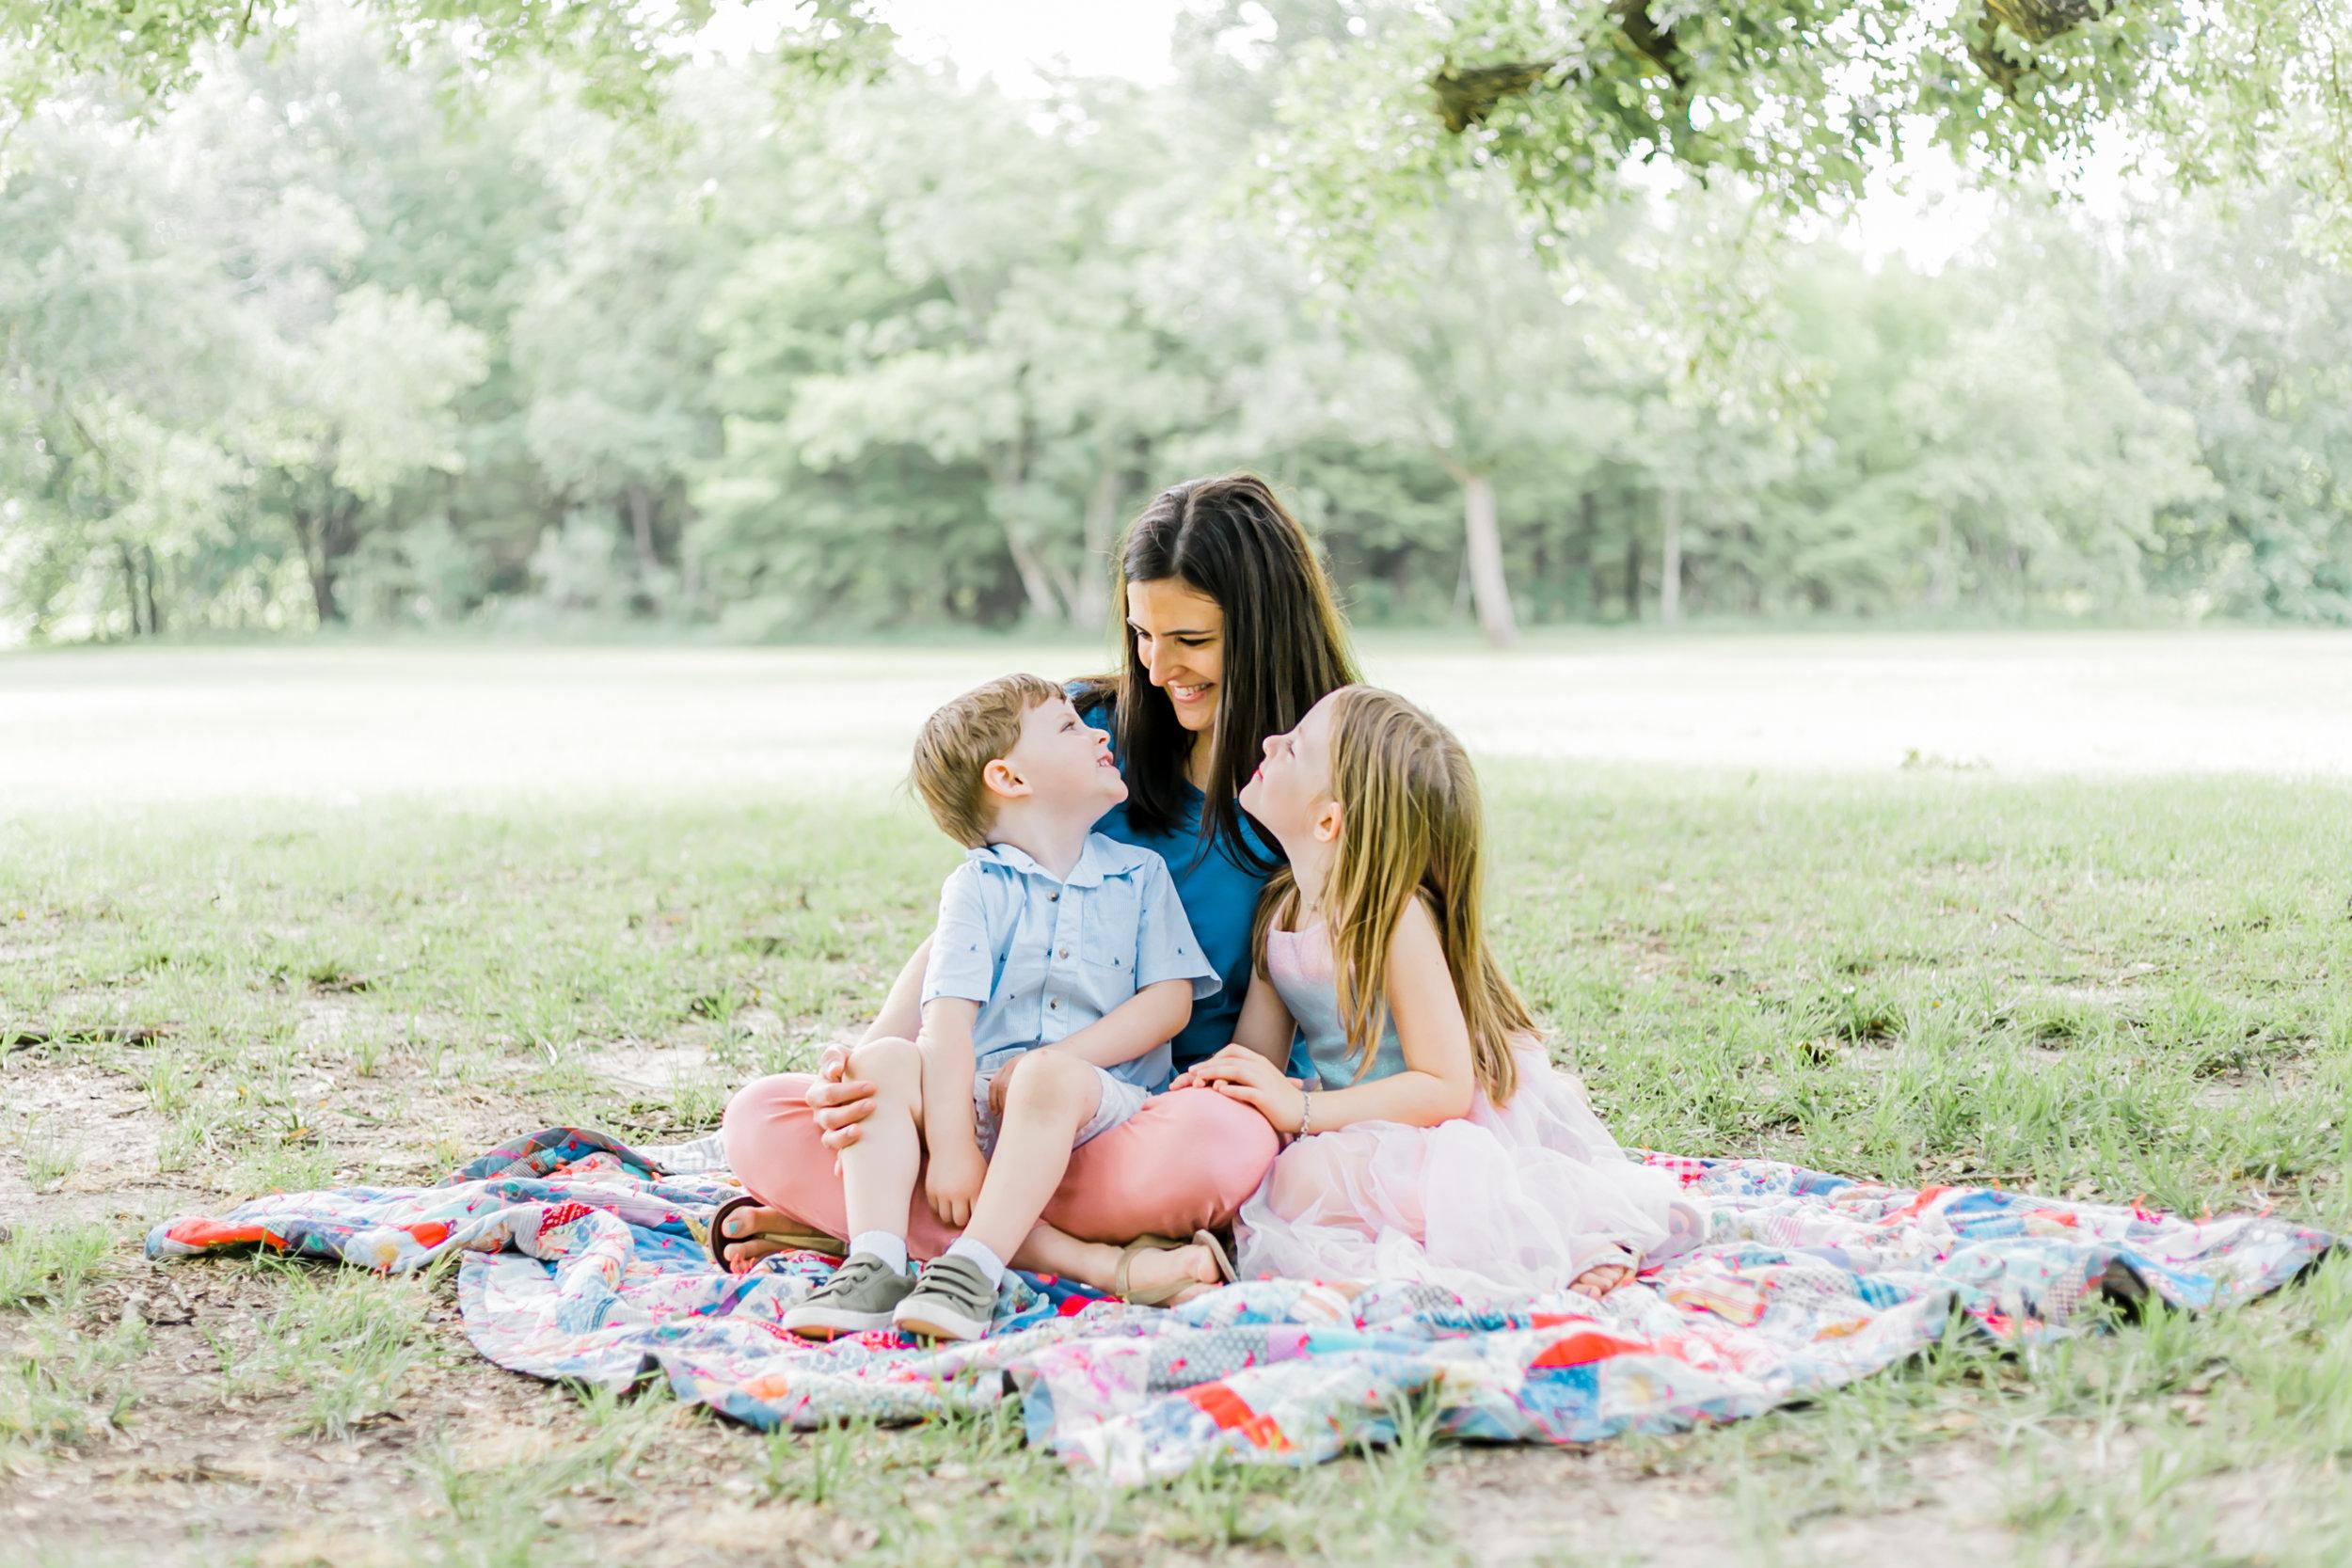 MothersDayMini-Blog-Kinnon-5.jpg